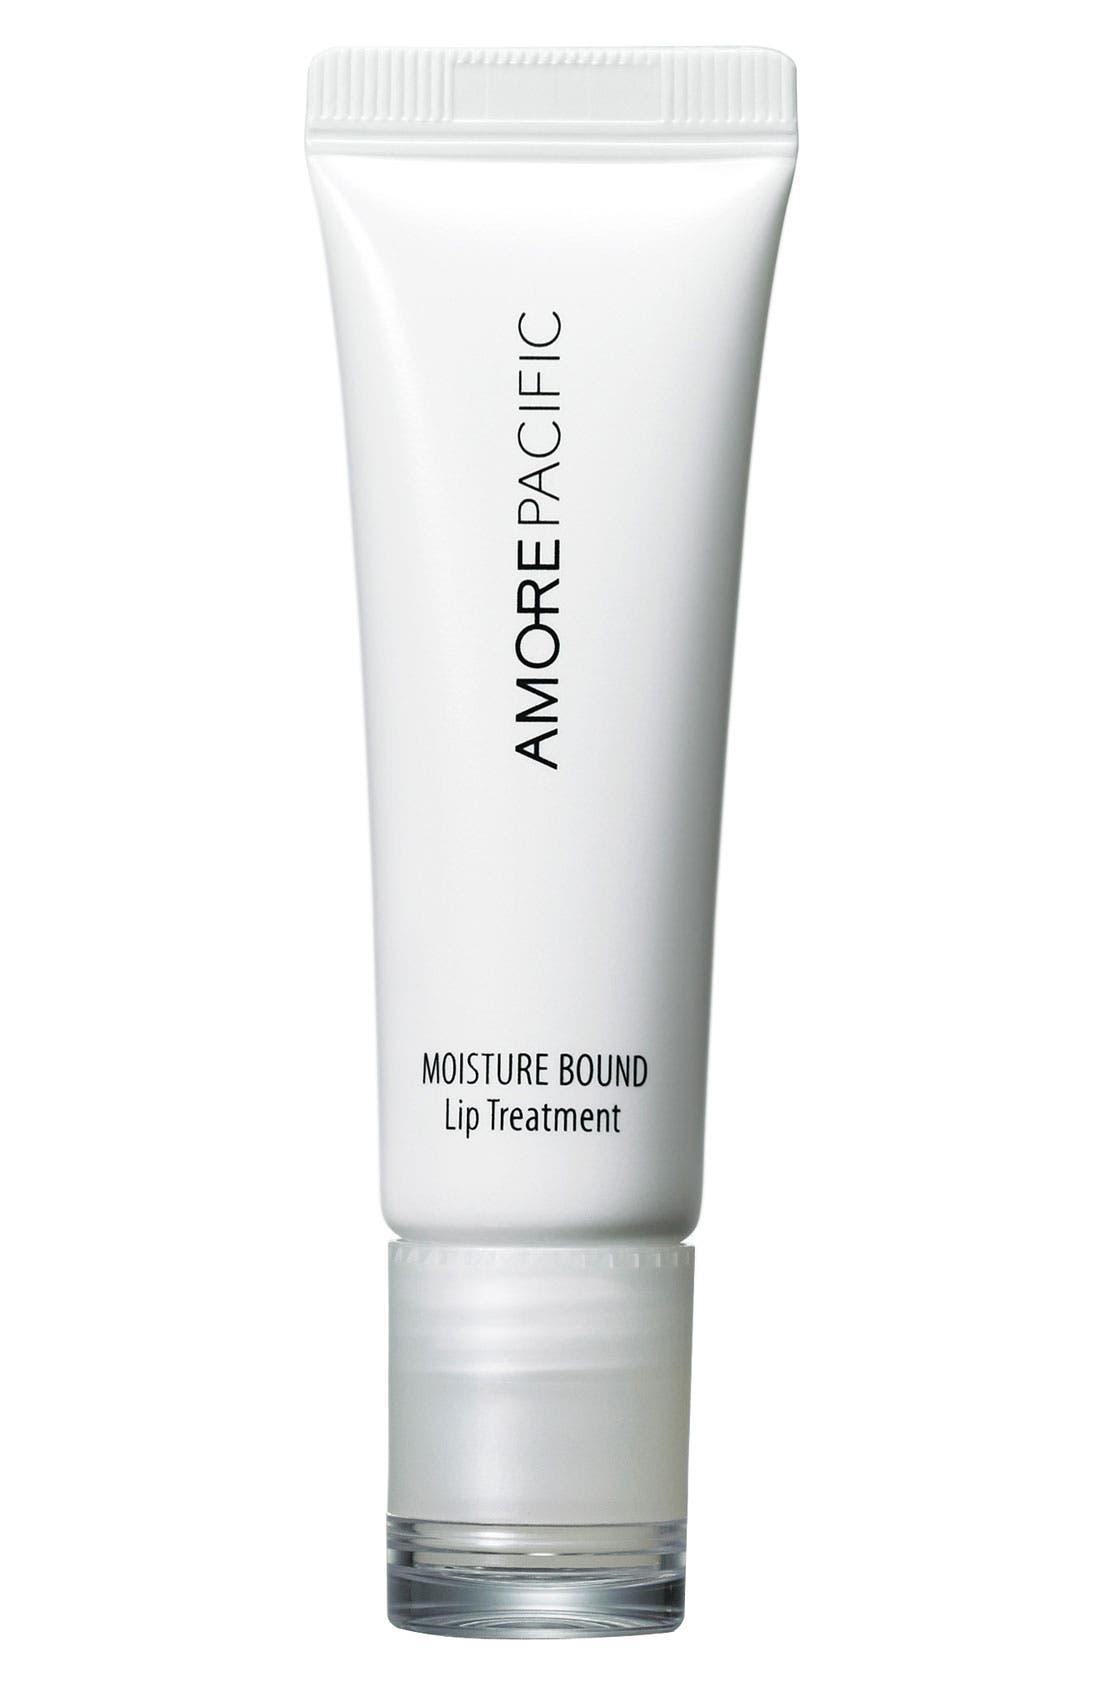 AMOREPACIFIC 'Moisture Bound' Lip Treatment